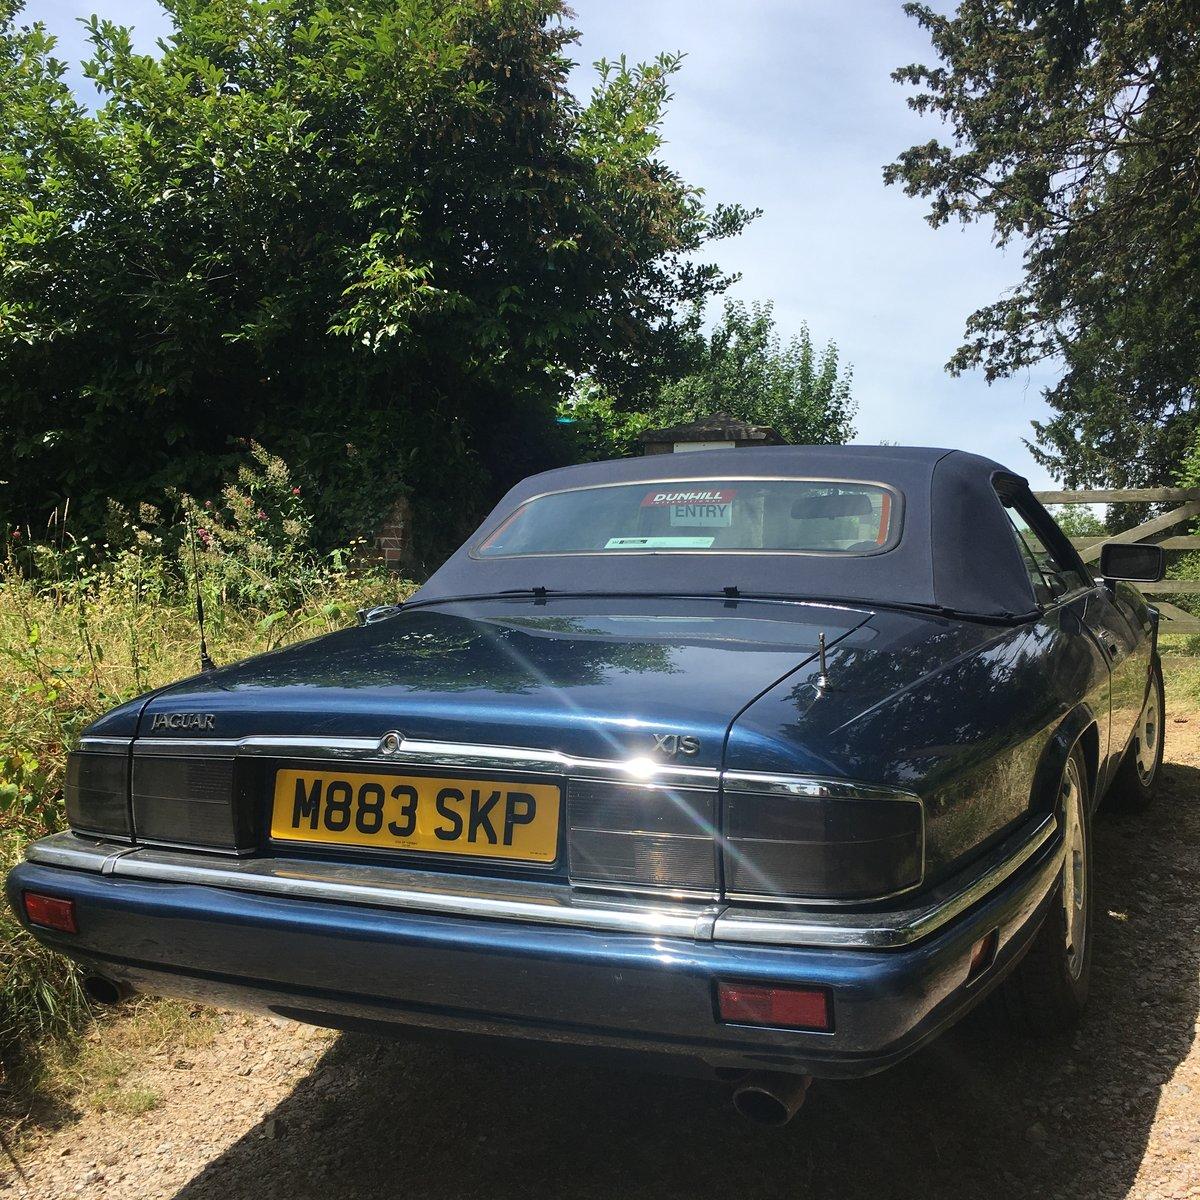 1995 Jaguar xjs Convertible For Sale (picture 4 of 6)